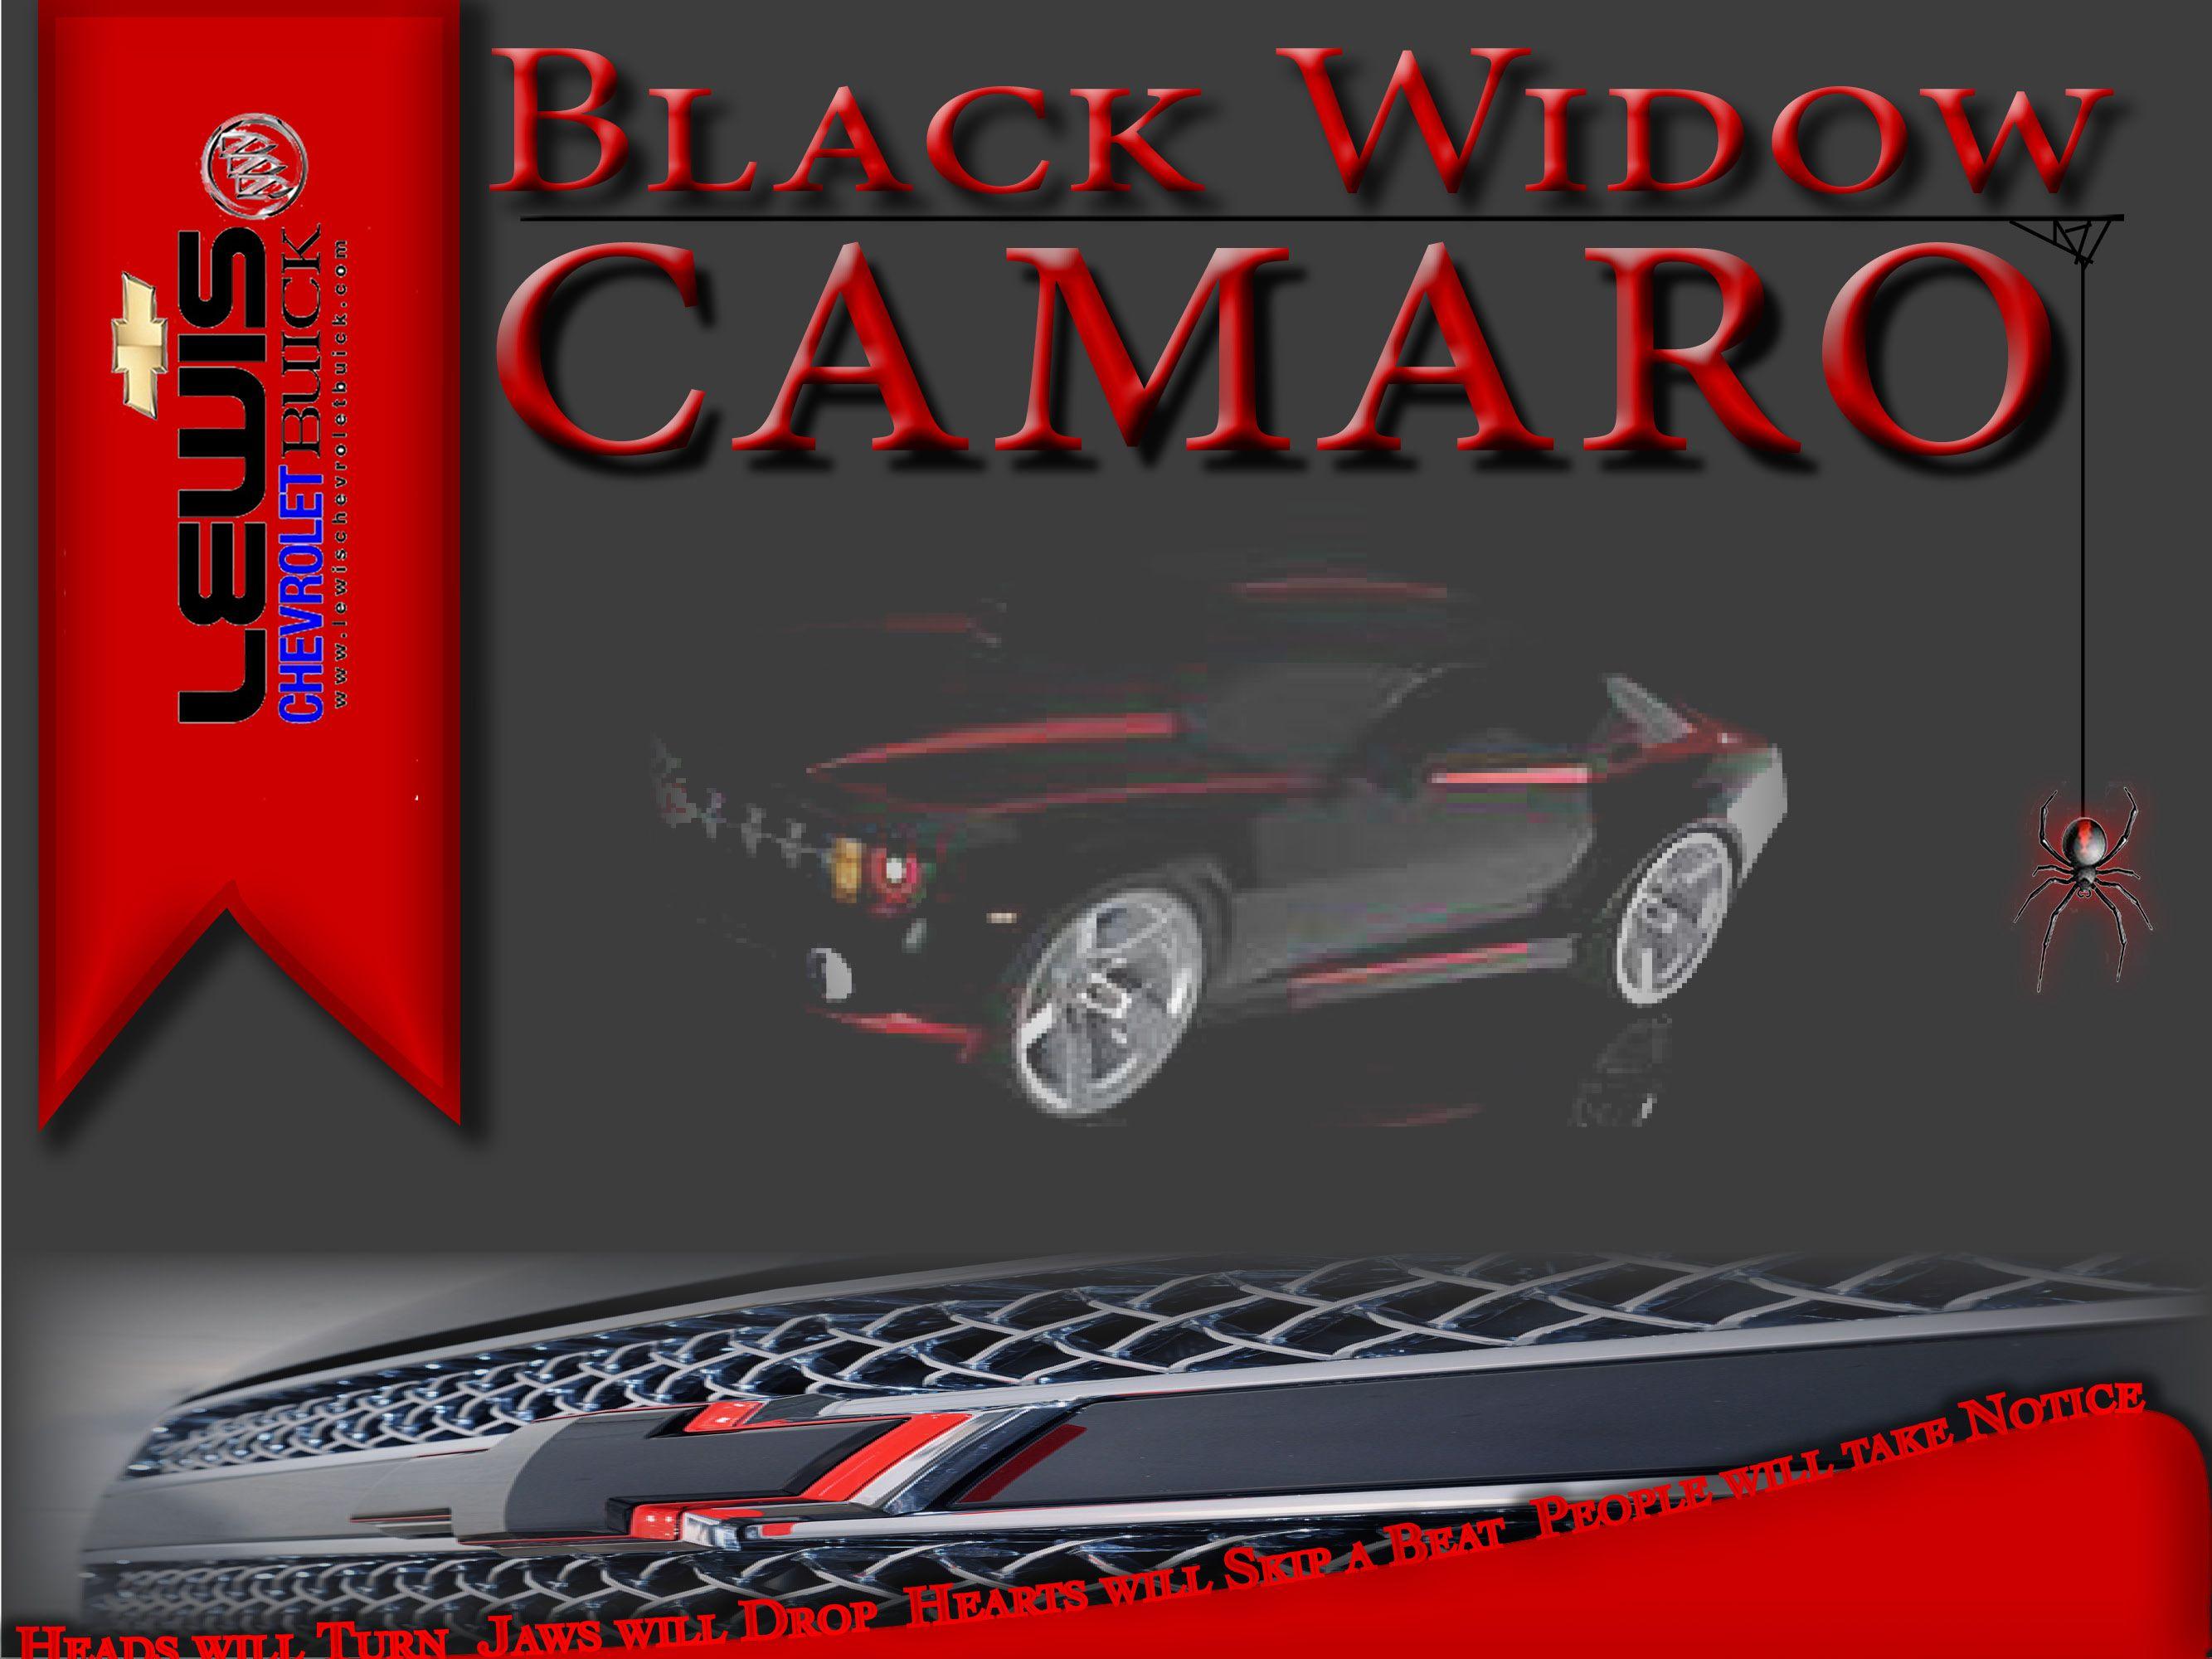 Black widow camaro camaro custom cars widow